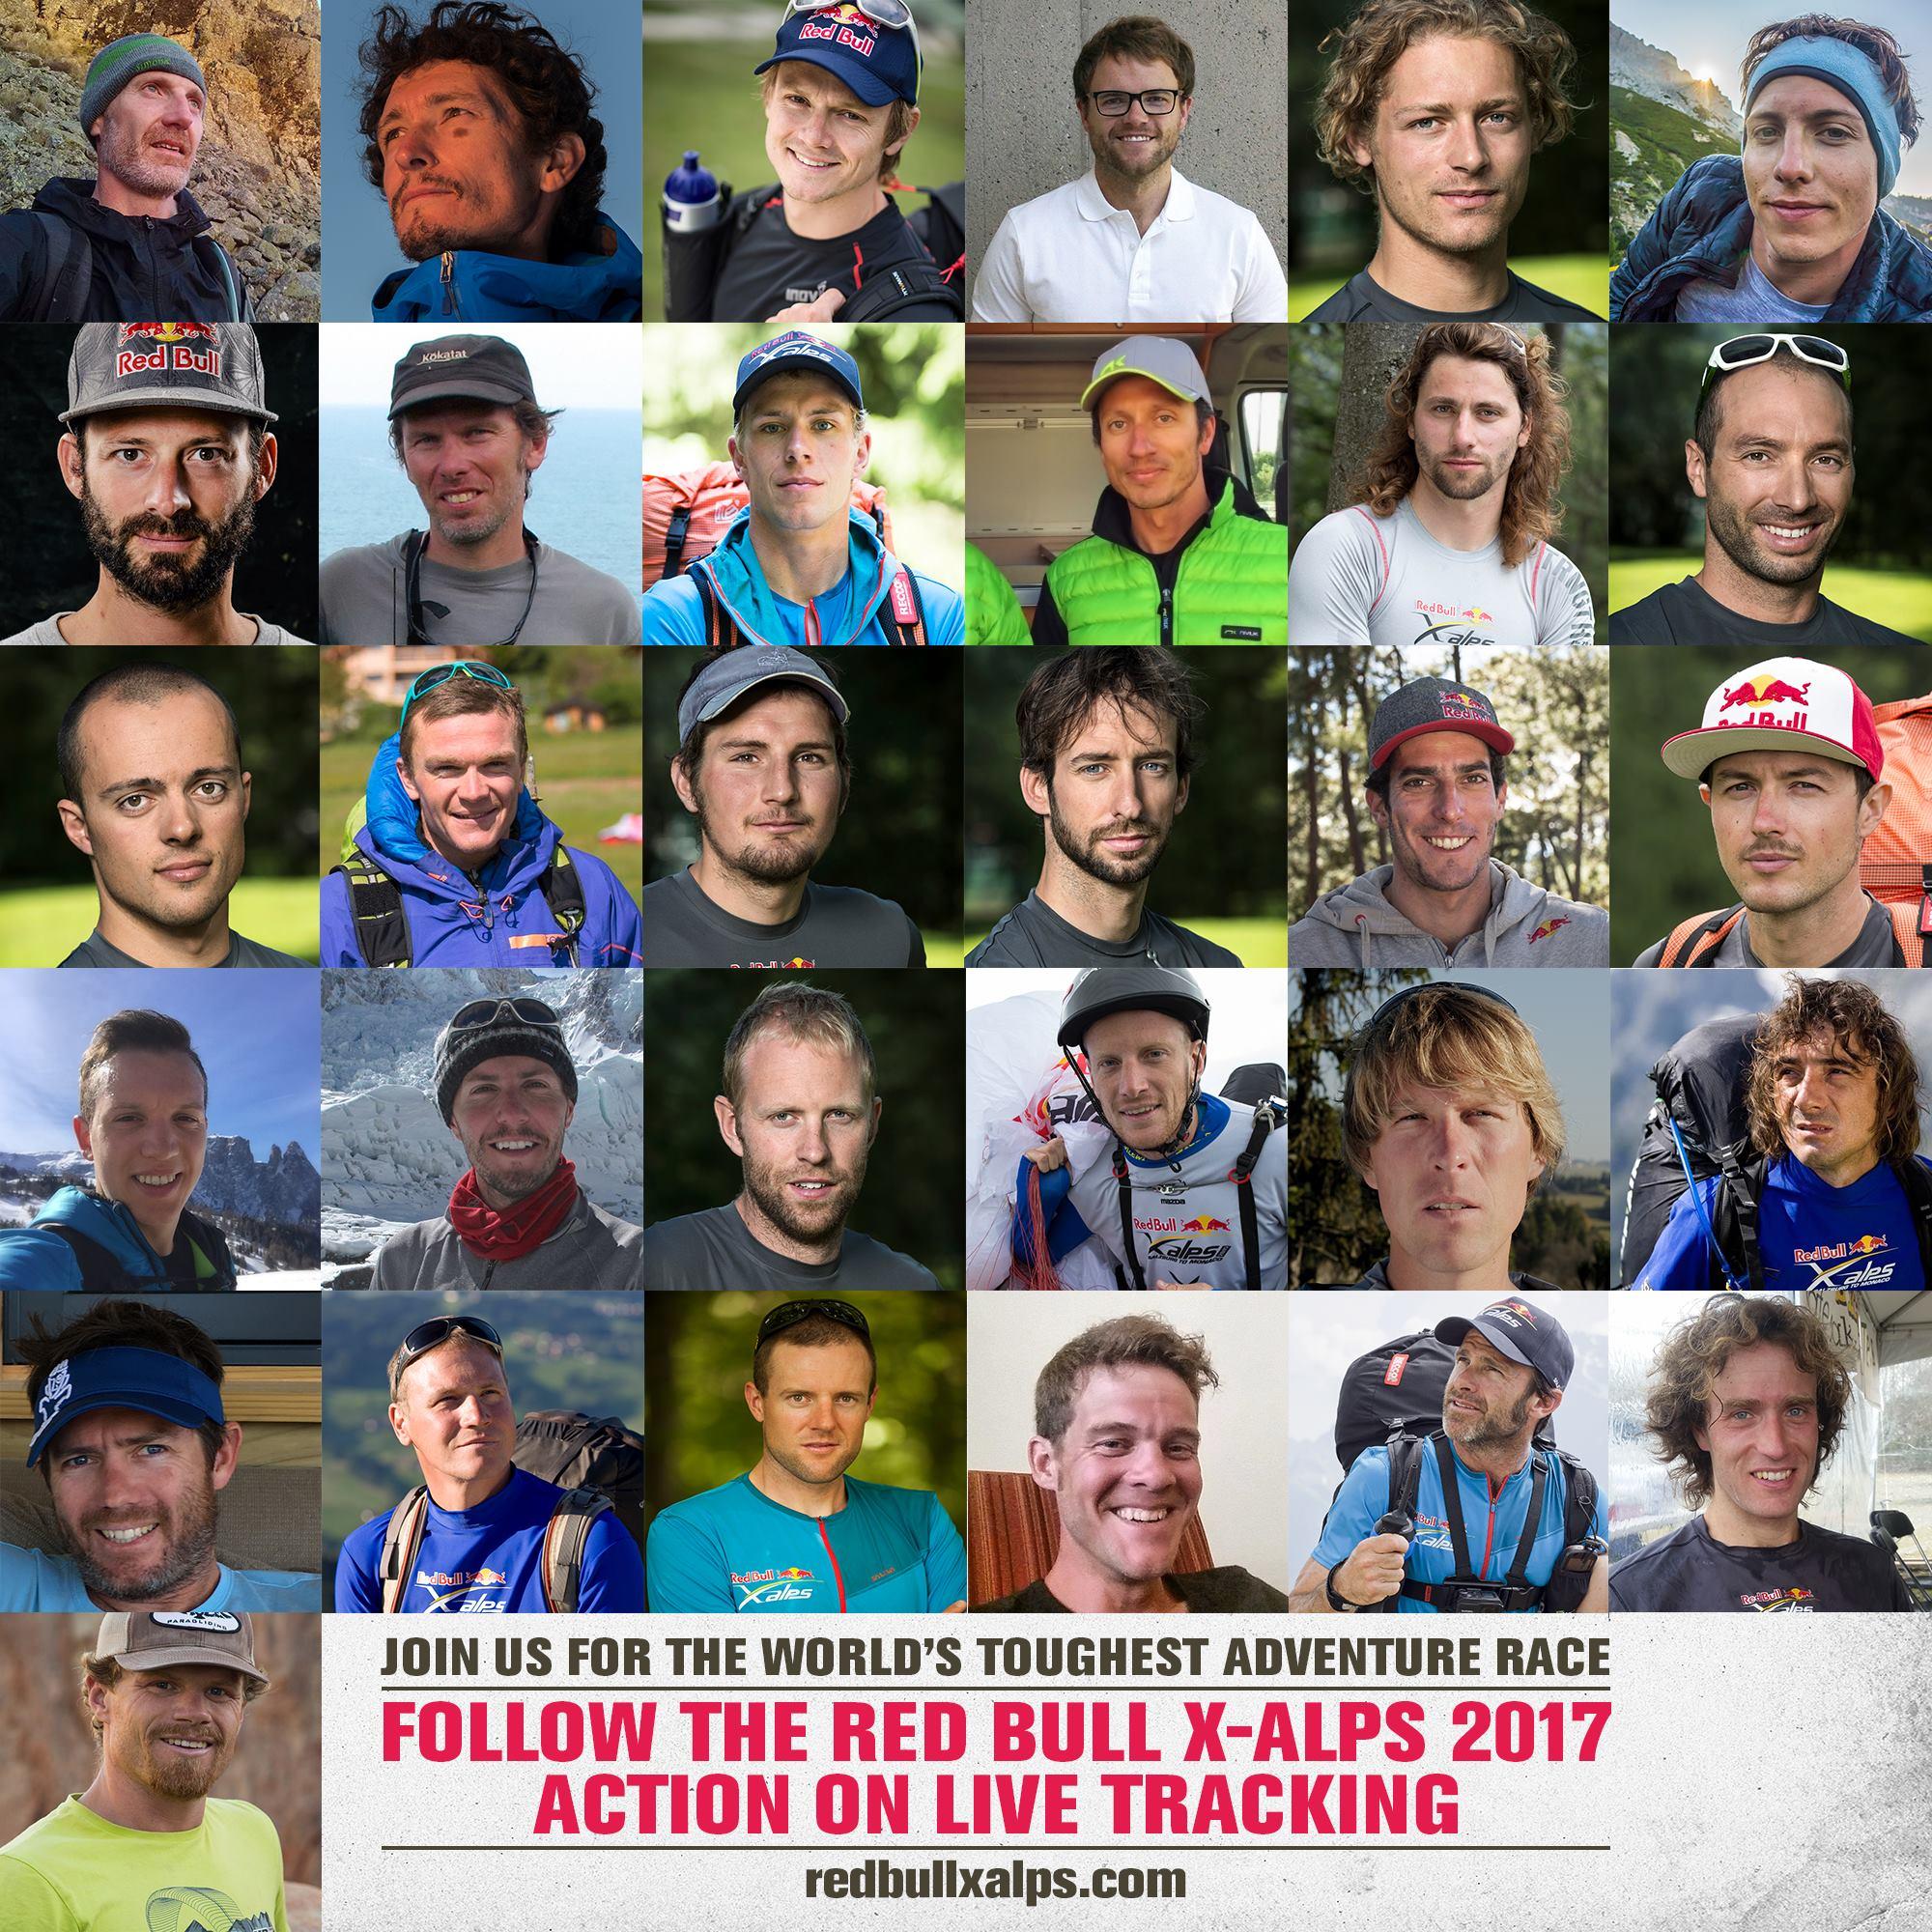 Zawodnicy Red Bull X-Alps 2017